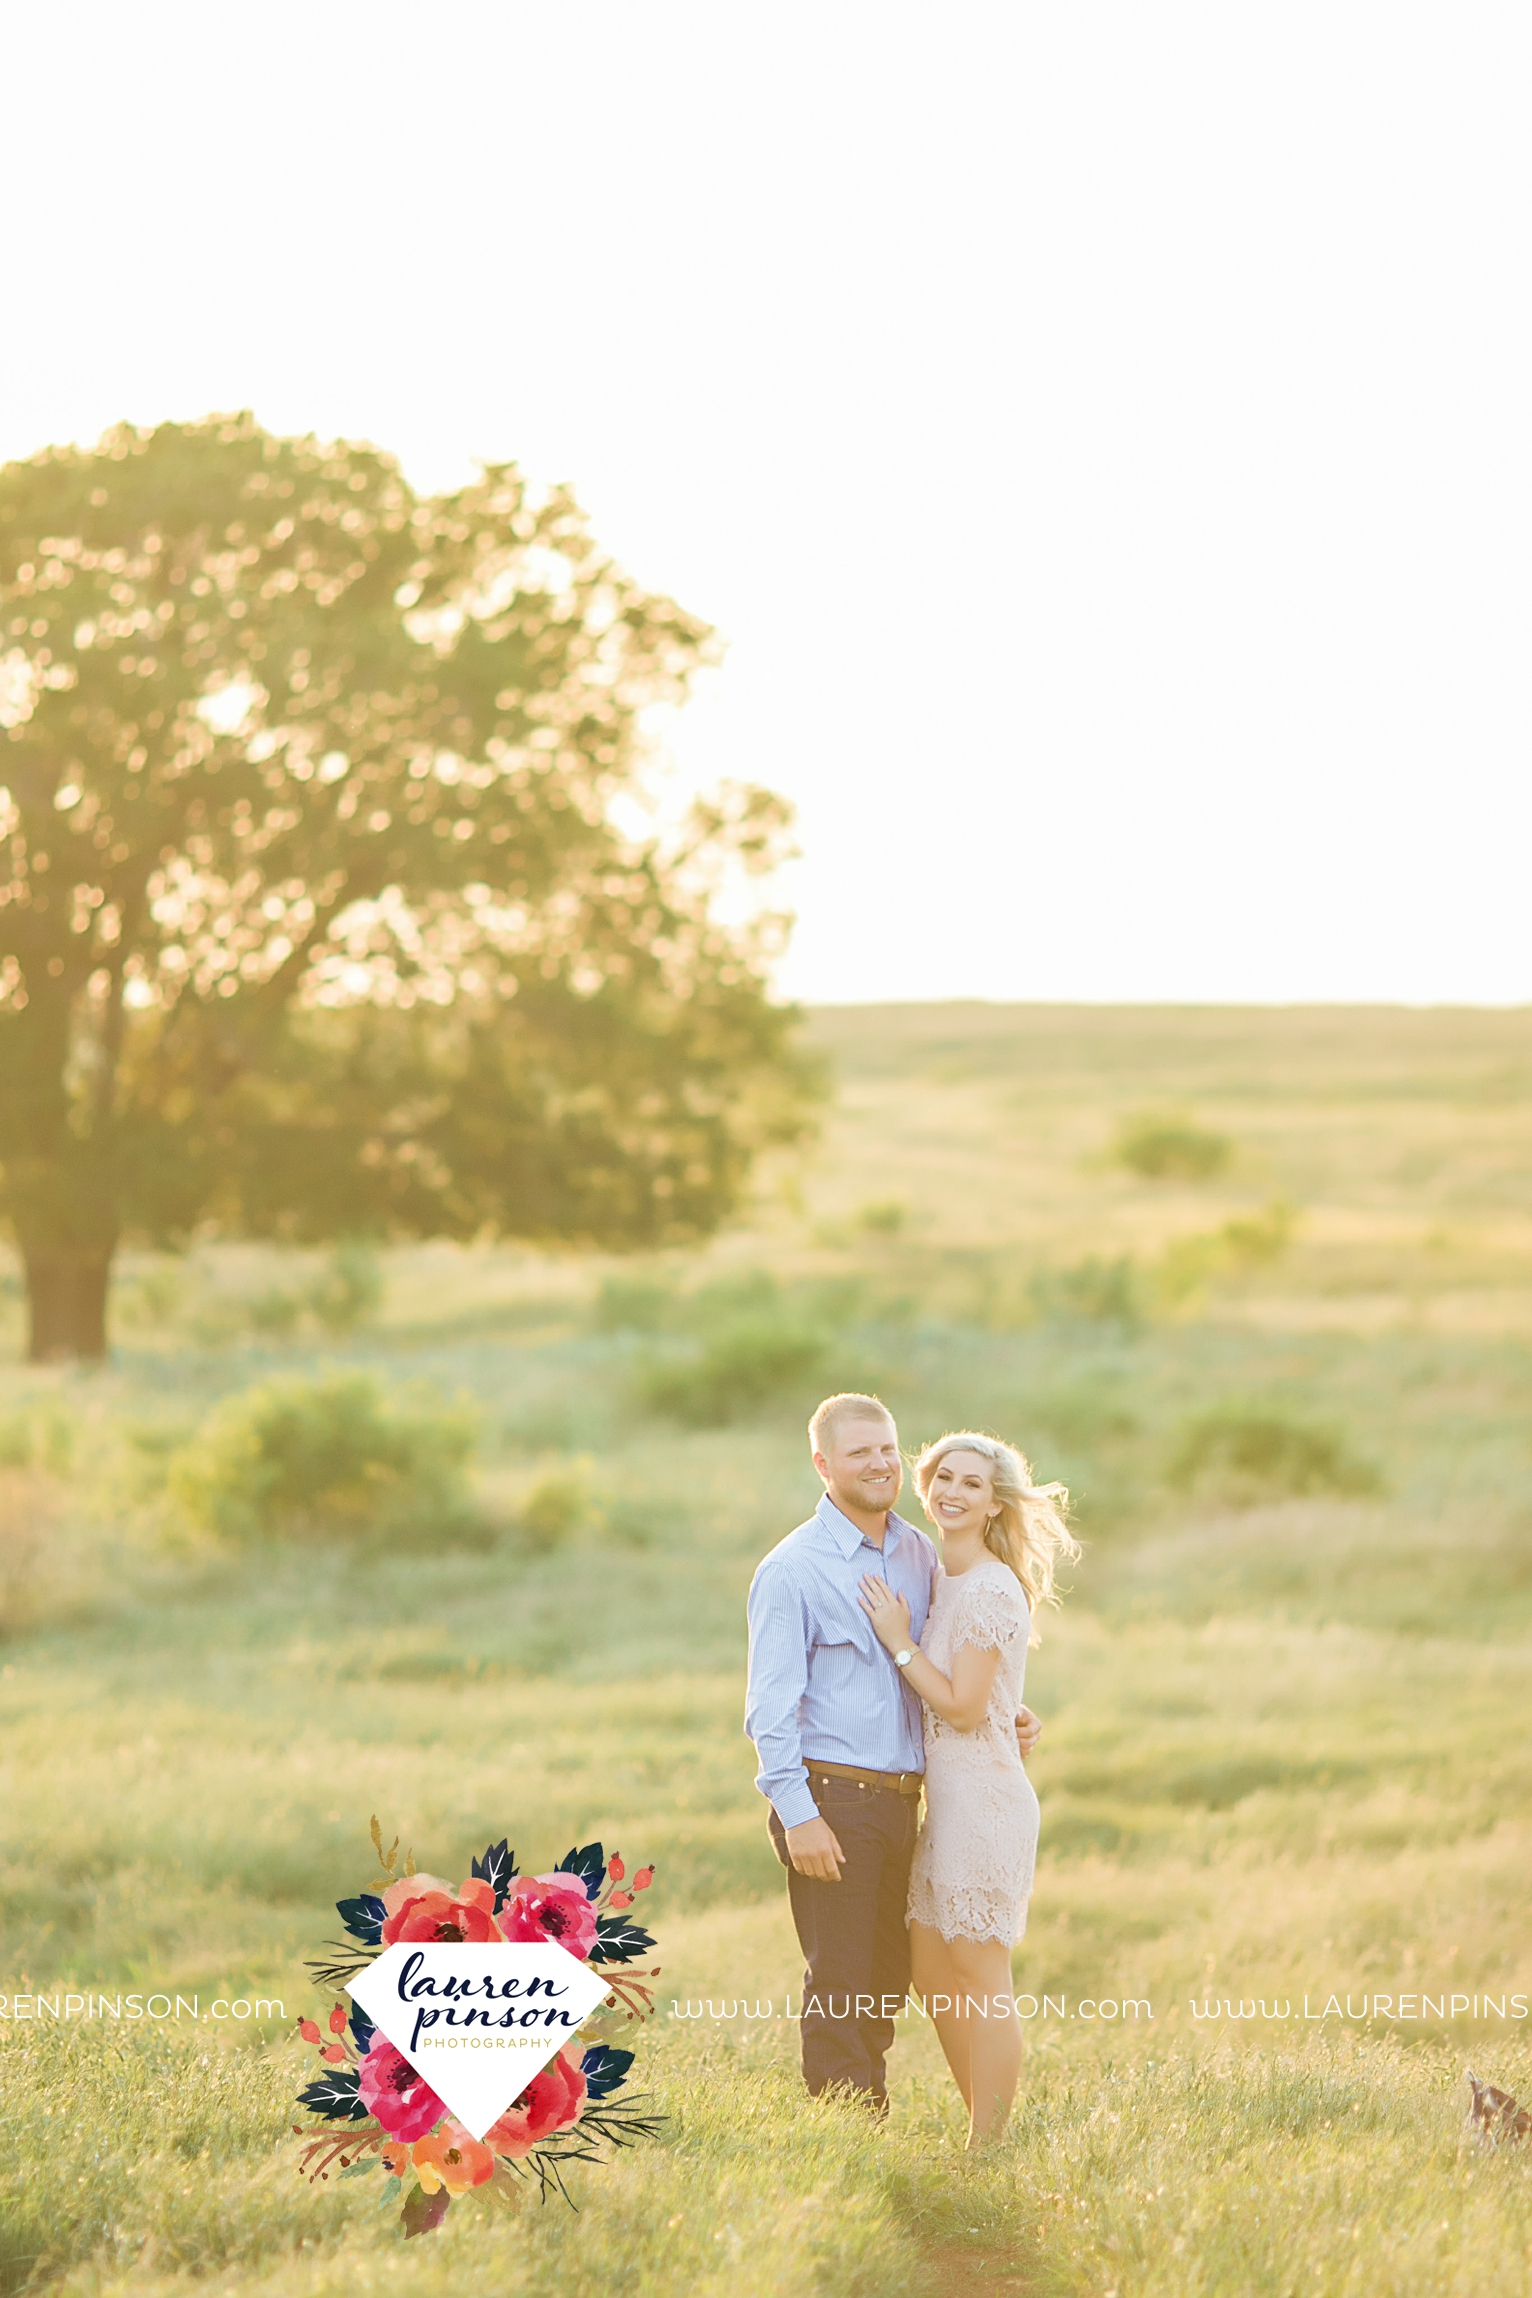 wichita-falls-texas-wedding-photographer-scotland-texas-engagement-session-country-barn-field-windthorst_2756.jpg